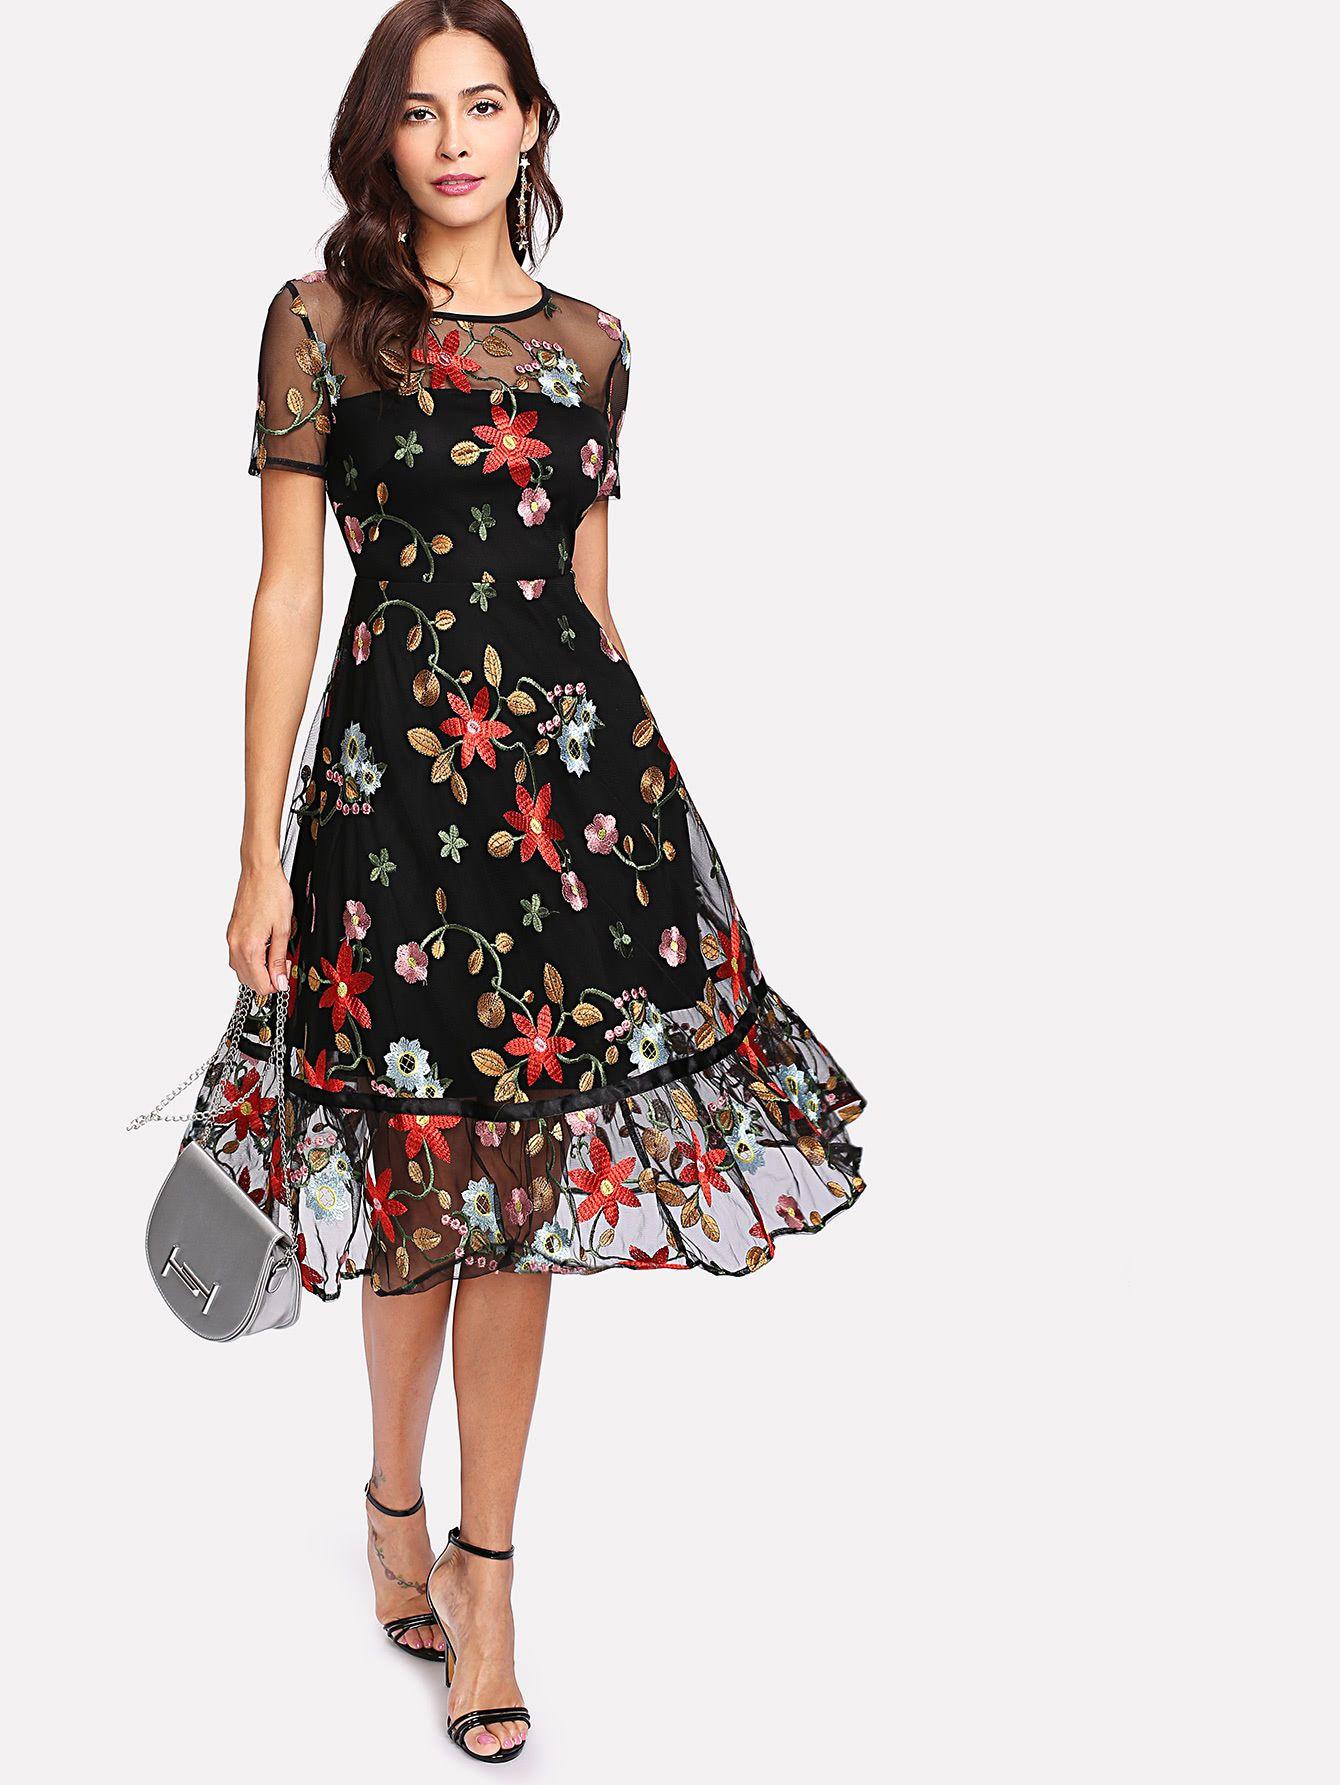 Botanical Embroidery Mesh Overlay Ruffle Hem Dress -SheIn